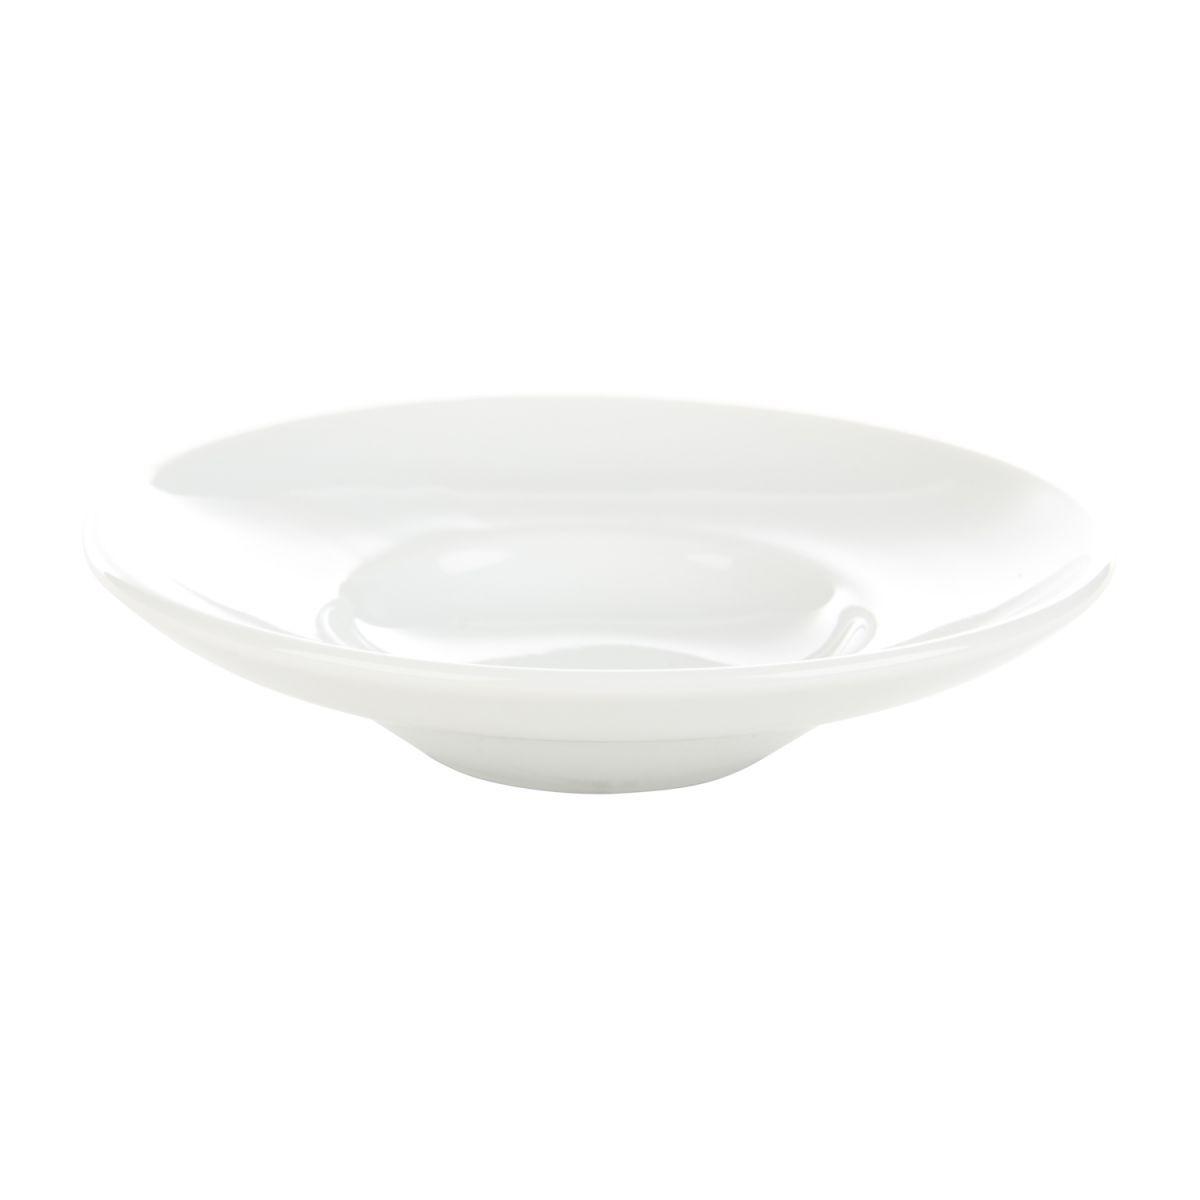 plate round 13 cm box6